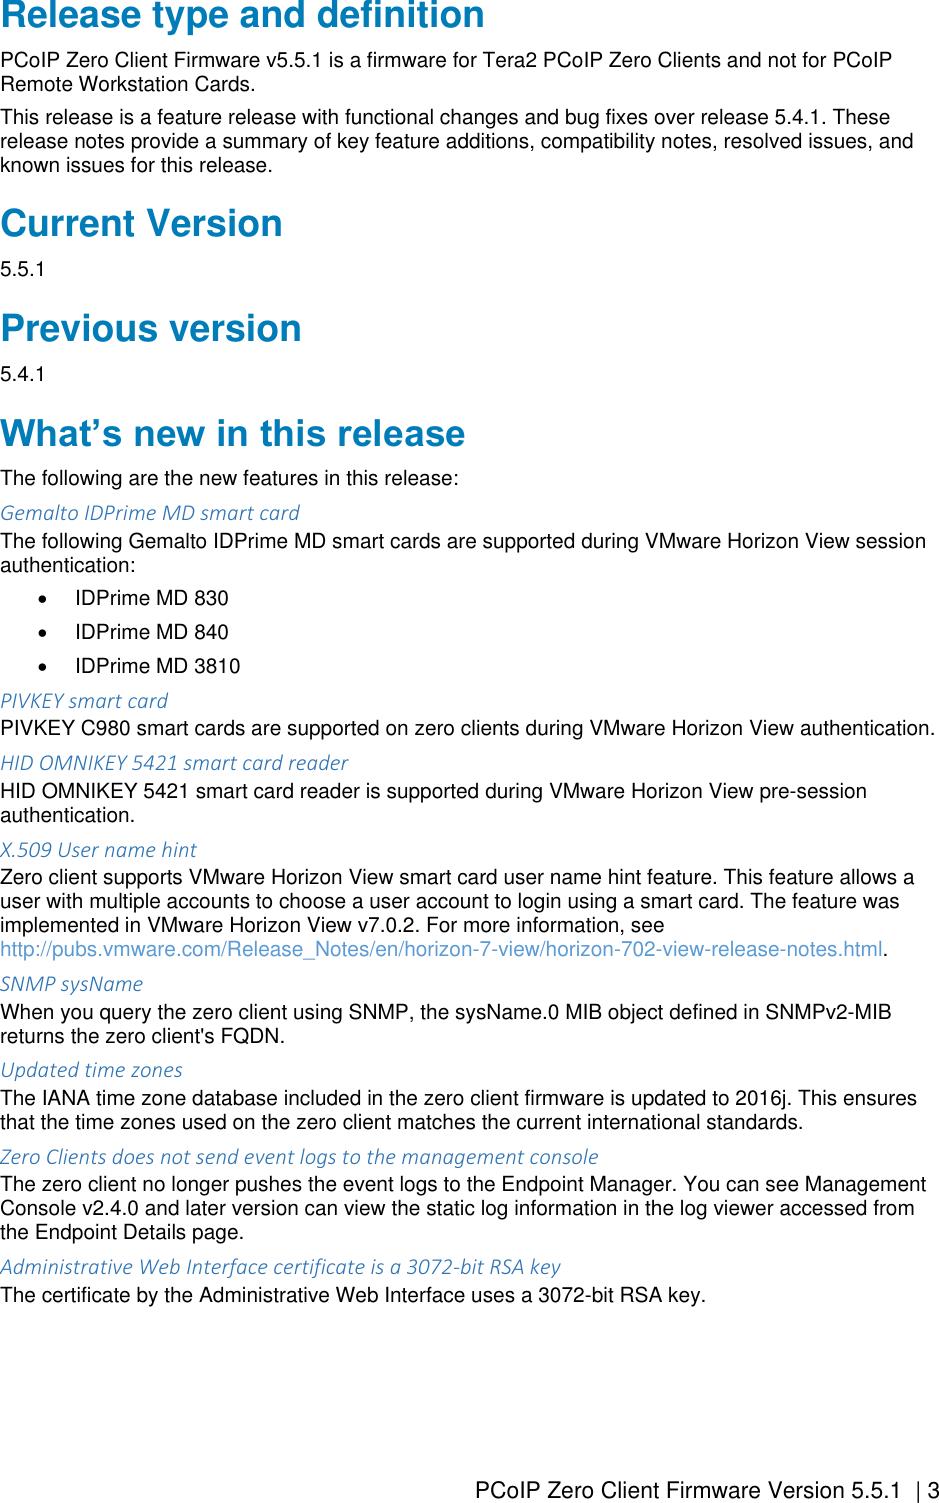 Dell Wyse 7030 zero client PCoIP Firmware Version 5 5 1